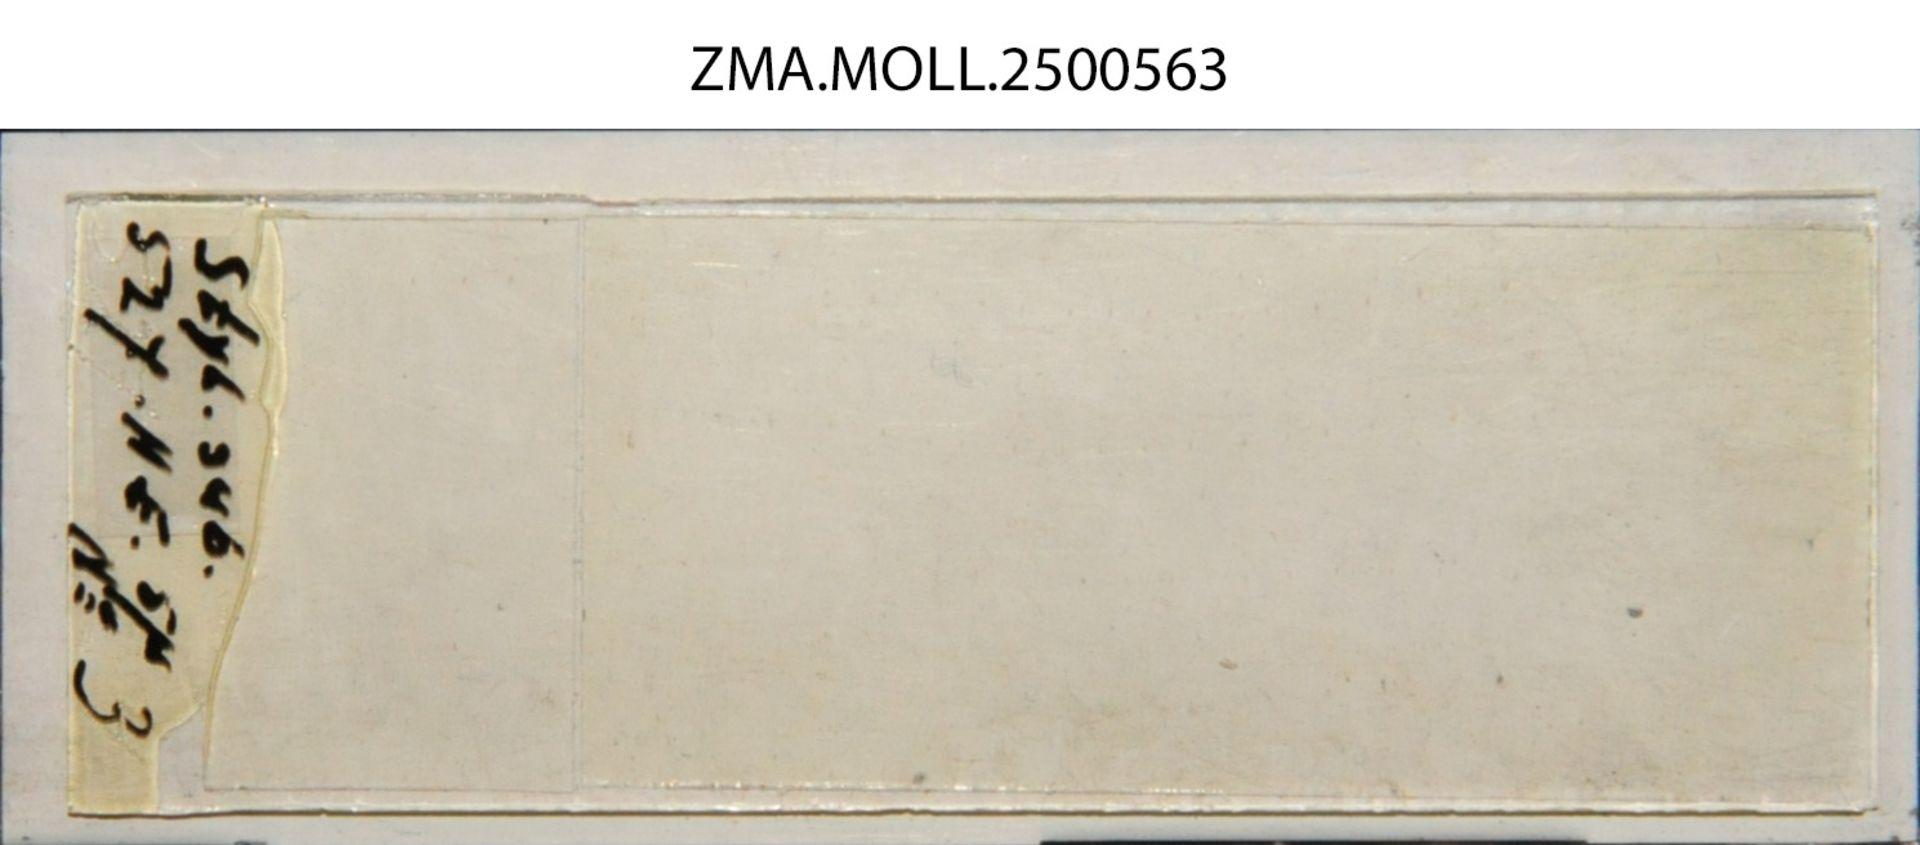 ZMA.MOLL.2500563 | Styliola subula (Quoy & Gaimard, 1827)